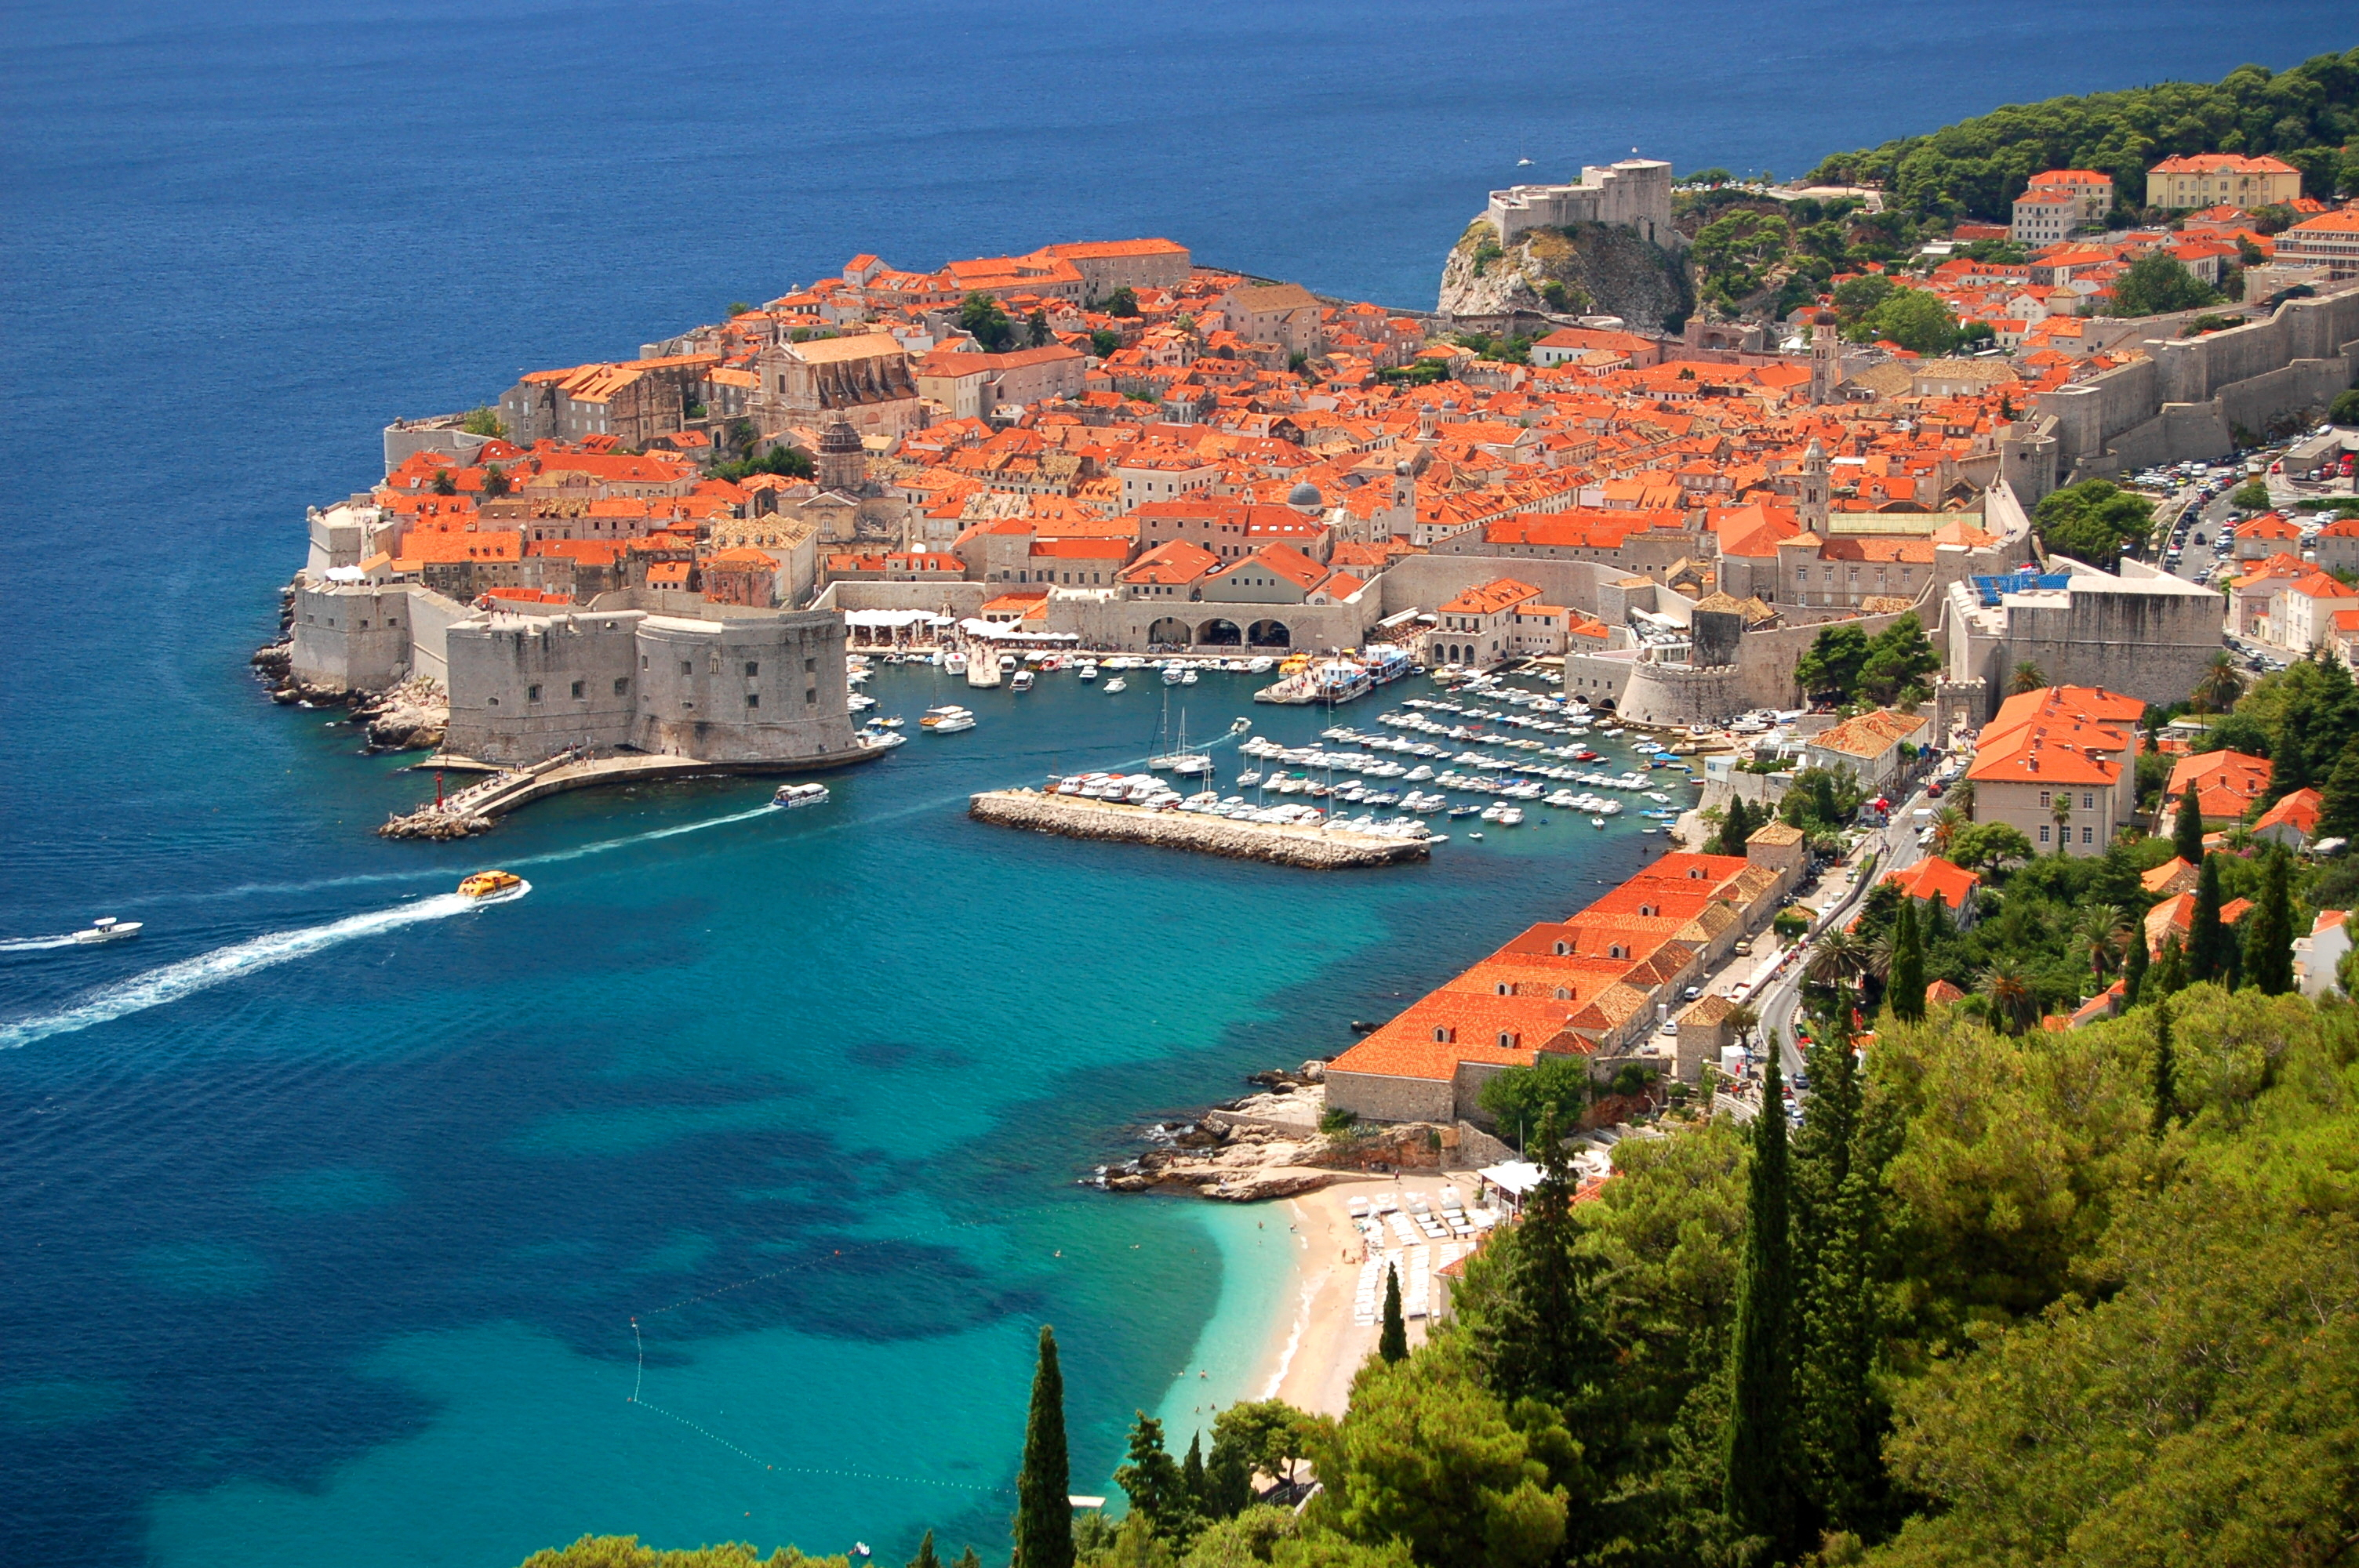 Dubrovnik Croatia  city photos gallery : Dubrovnik, Croatia